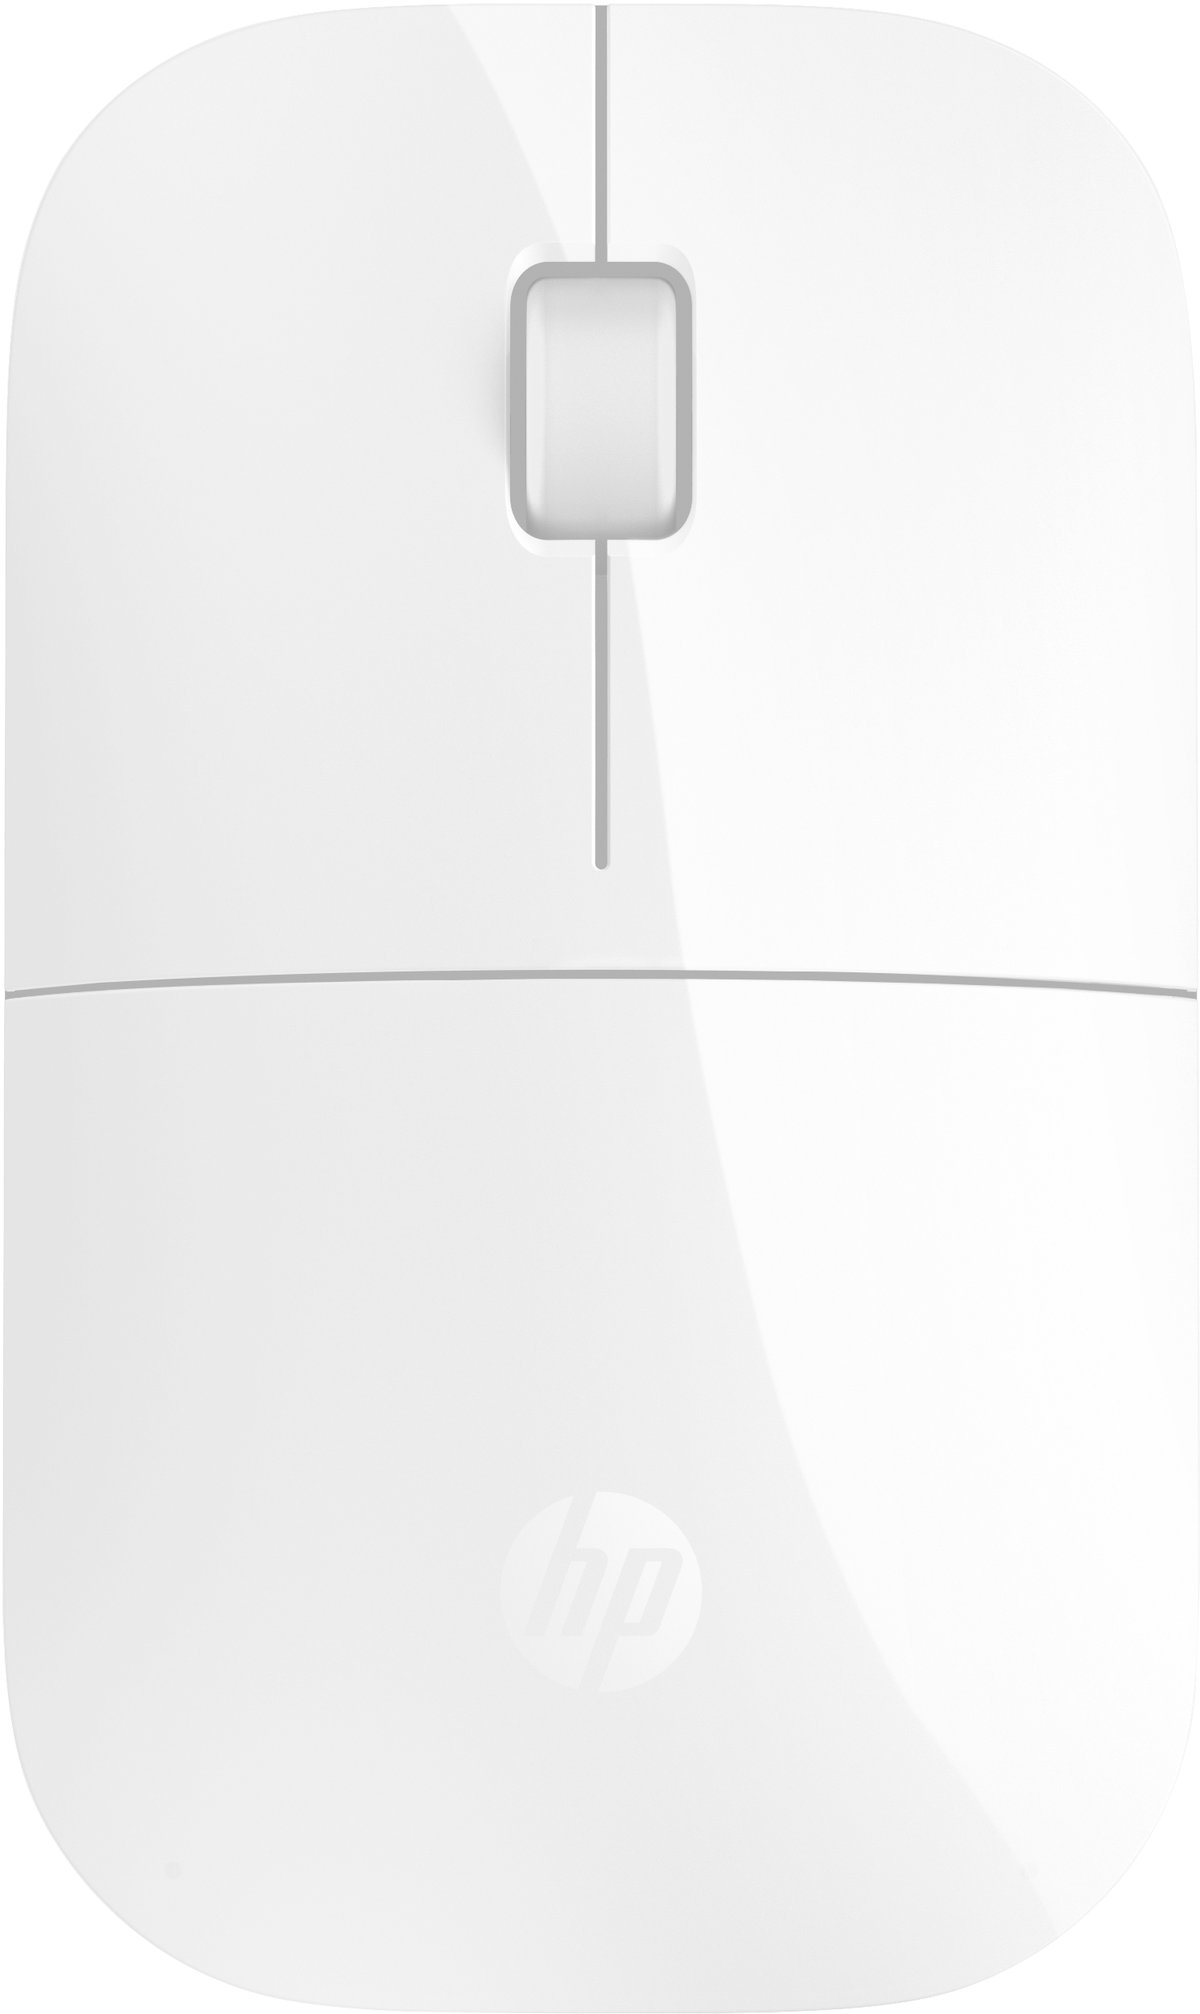 4ce8fa8878c HPshop.ie HP Z3700 RF Wireless Optical 1200DPI Ambidextrous White mice